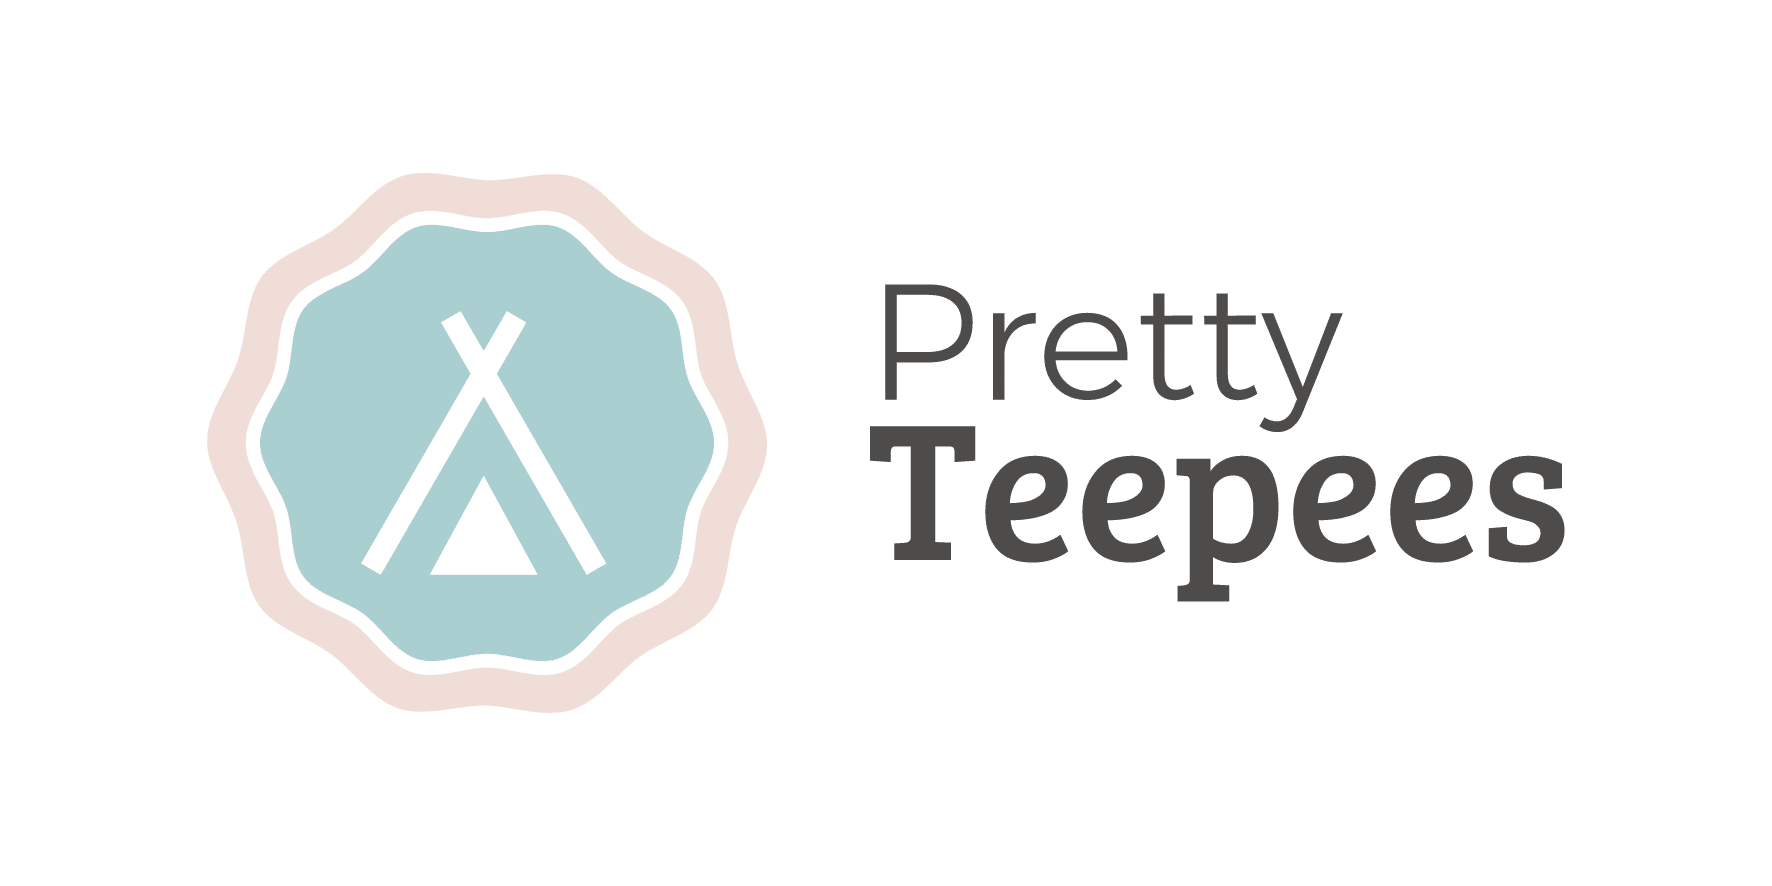 Pretty Teepees